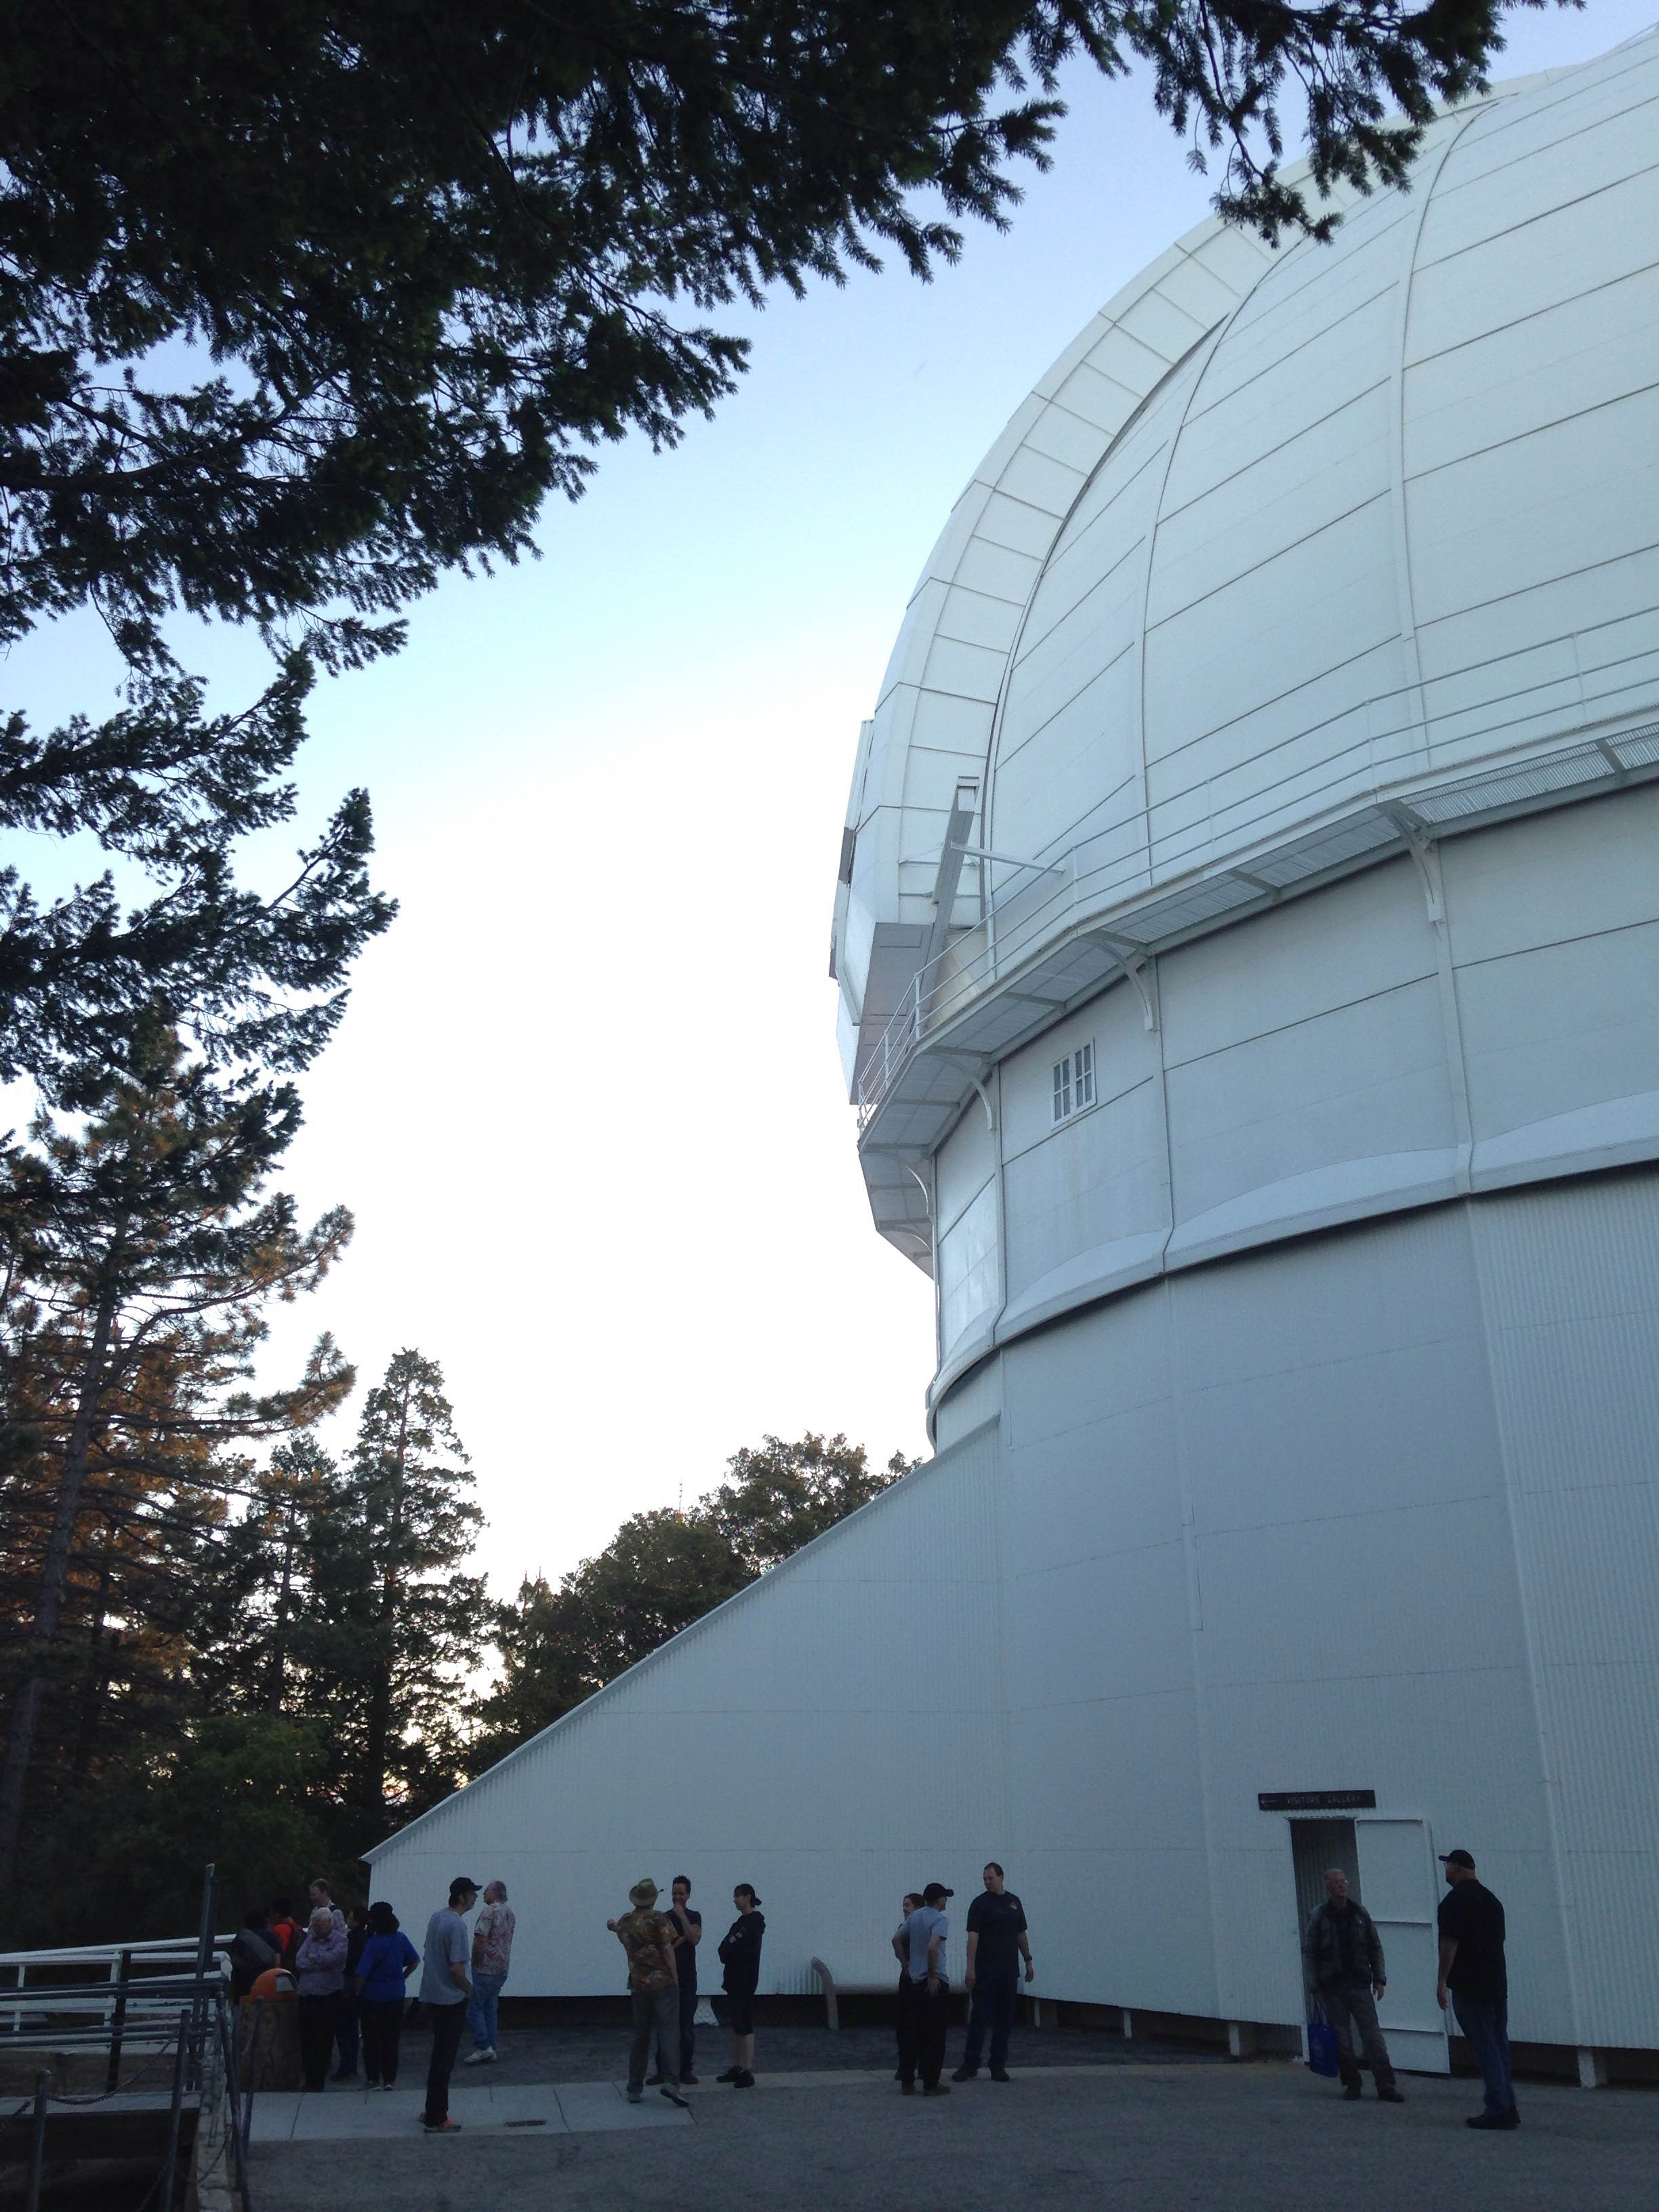 Mt Wilson 7 - 100-inch dome